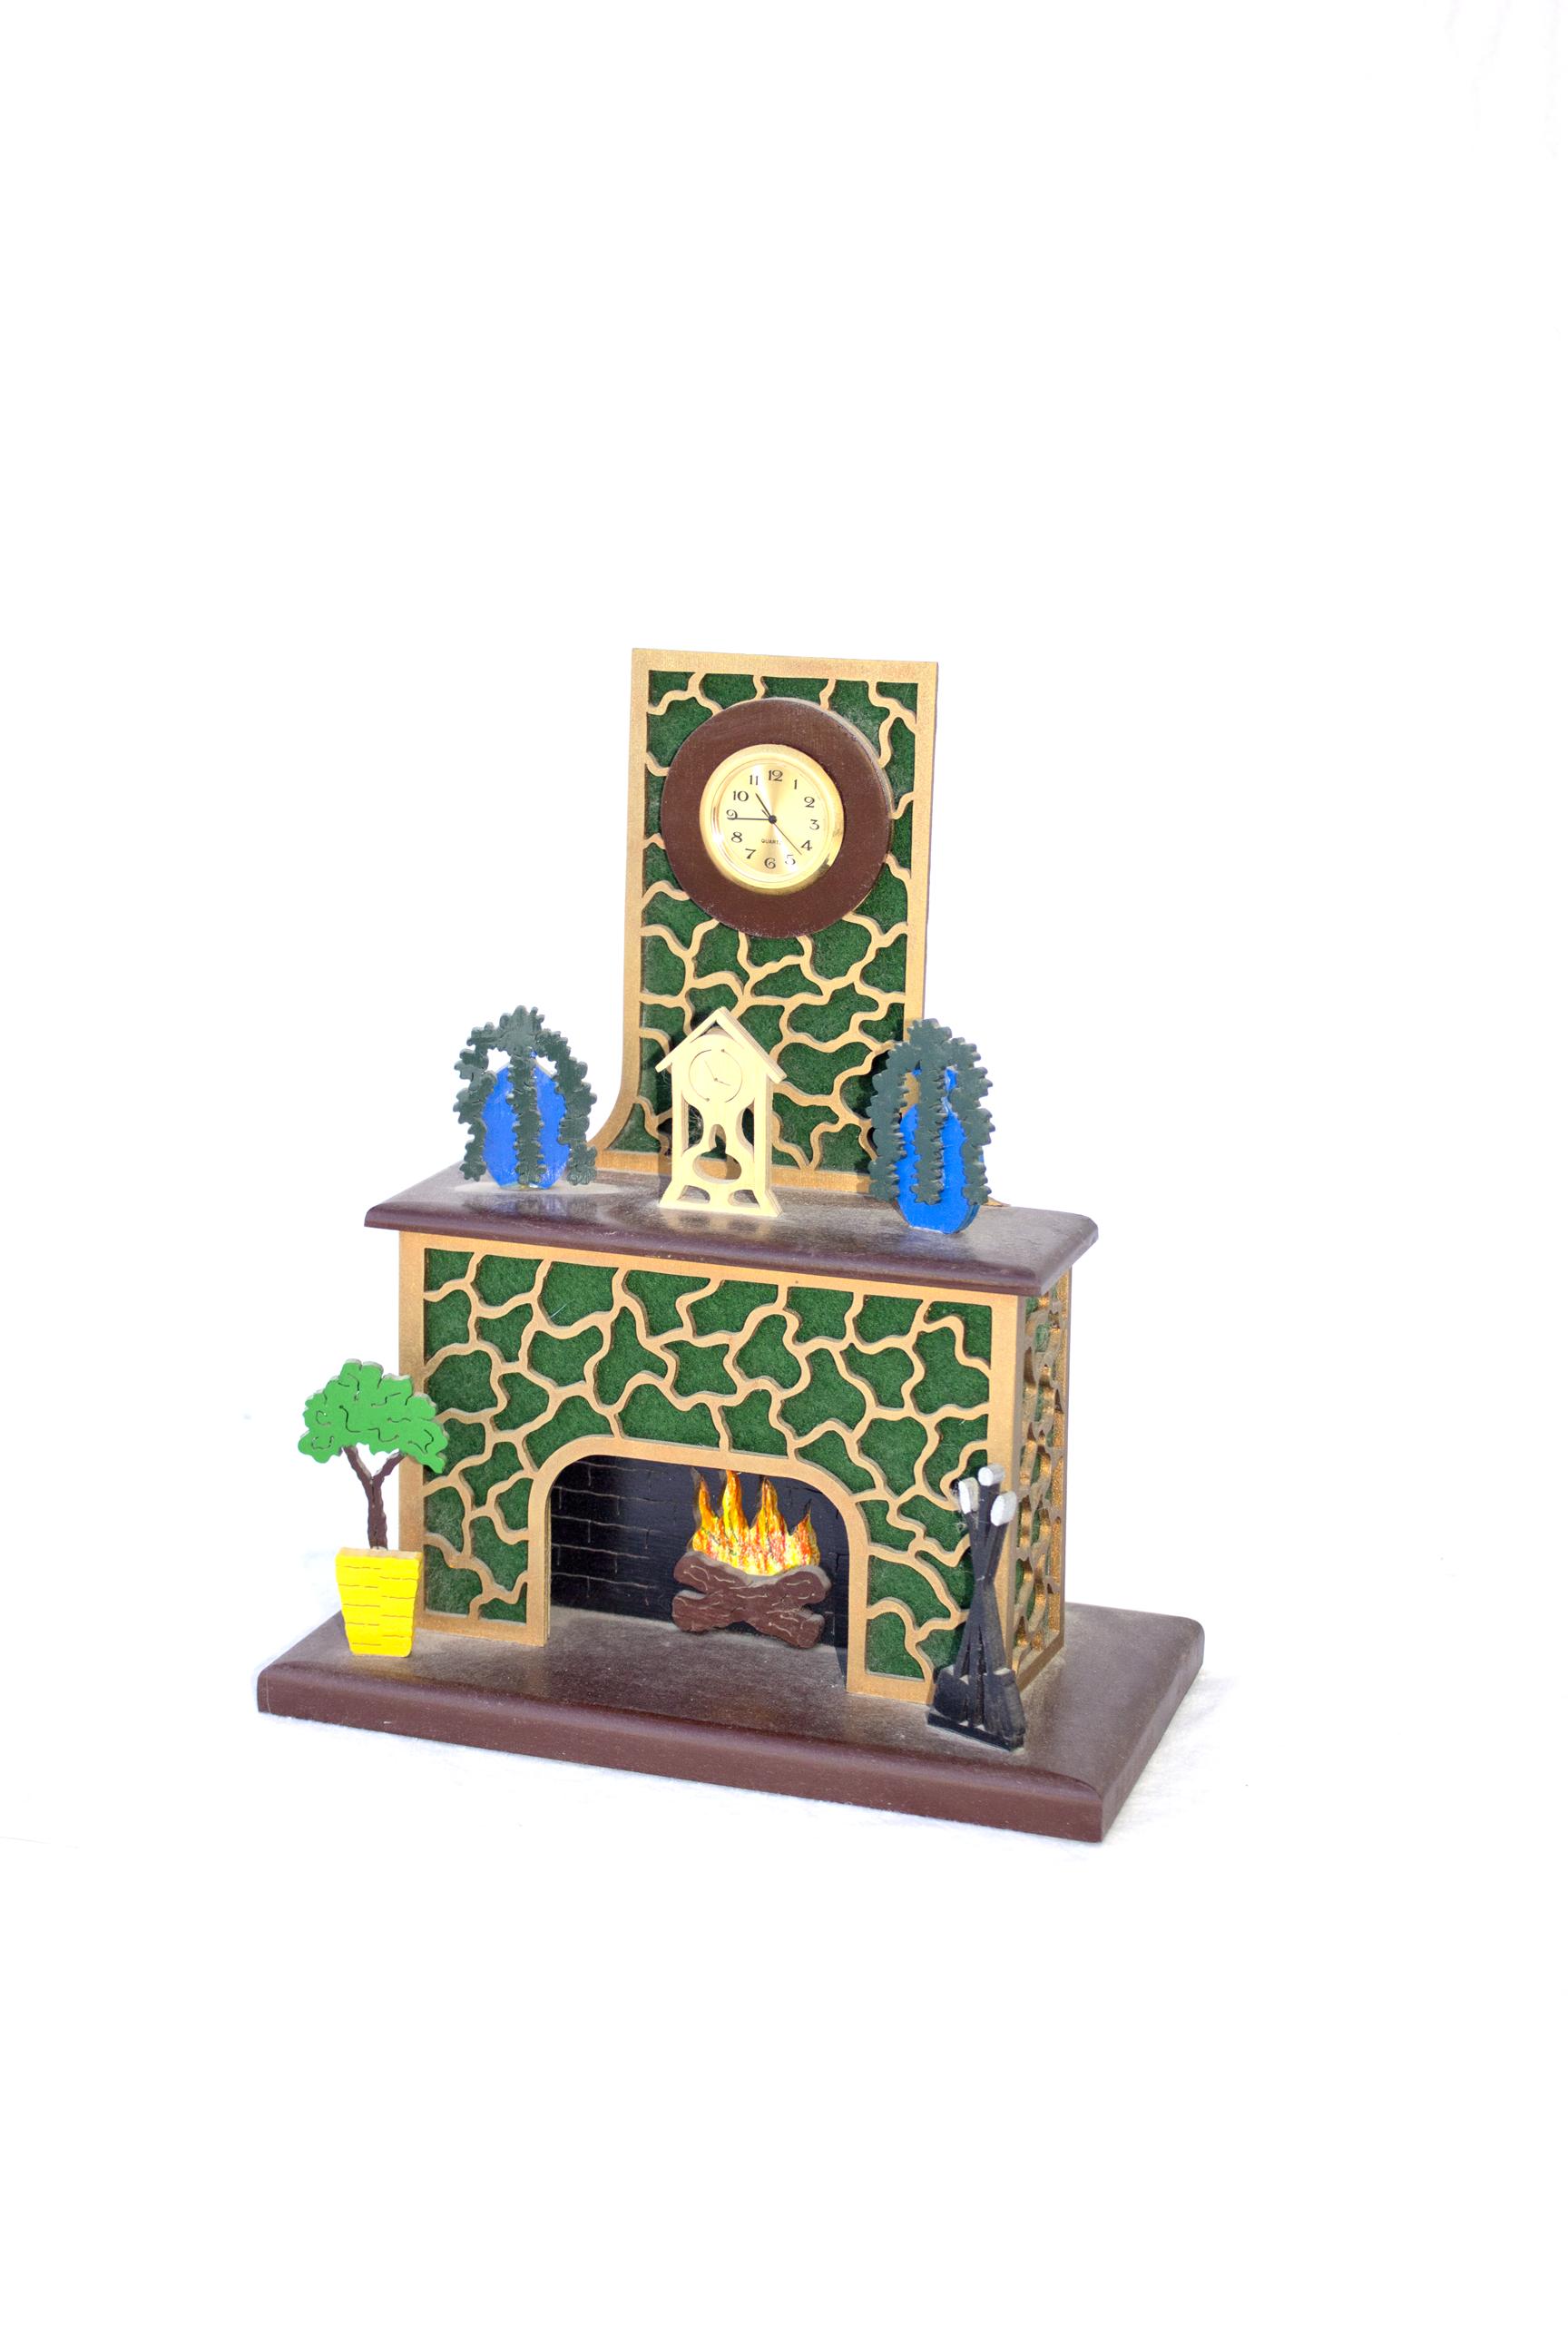 wilckens woodworking mini clock patterns